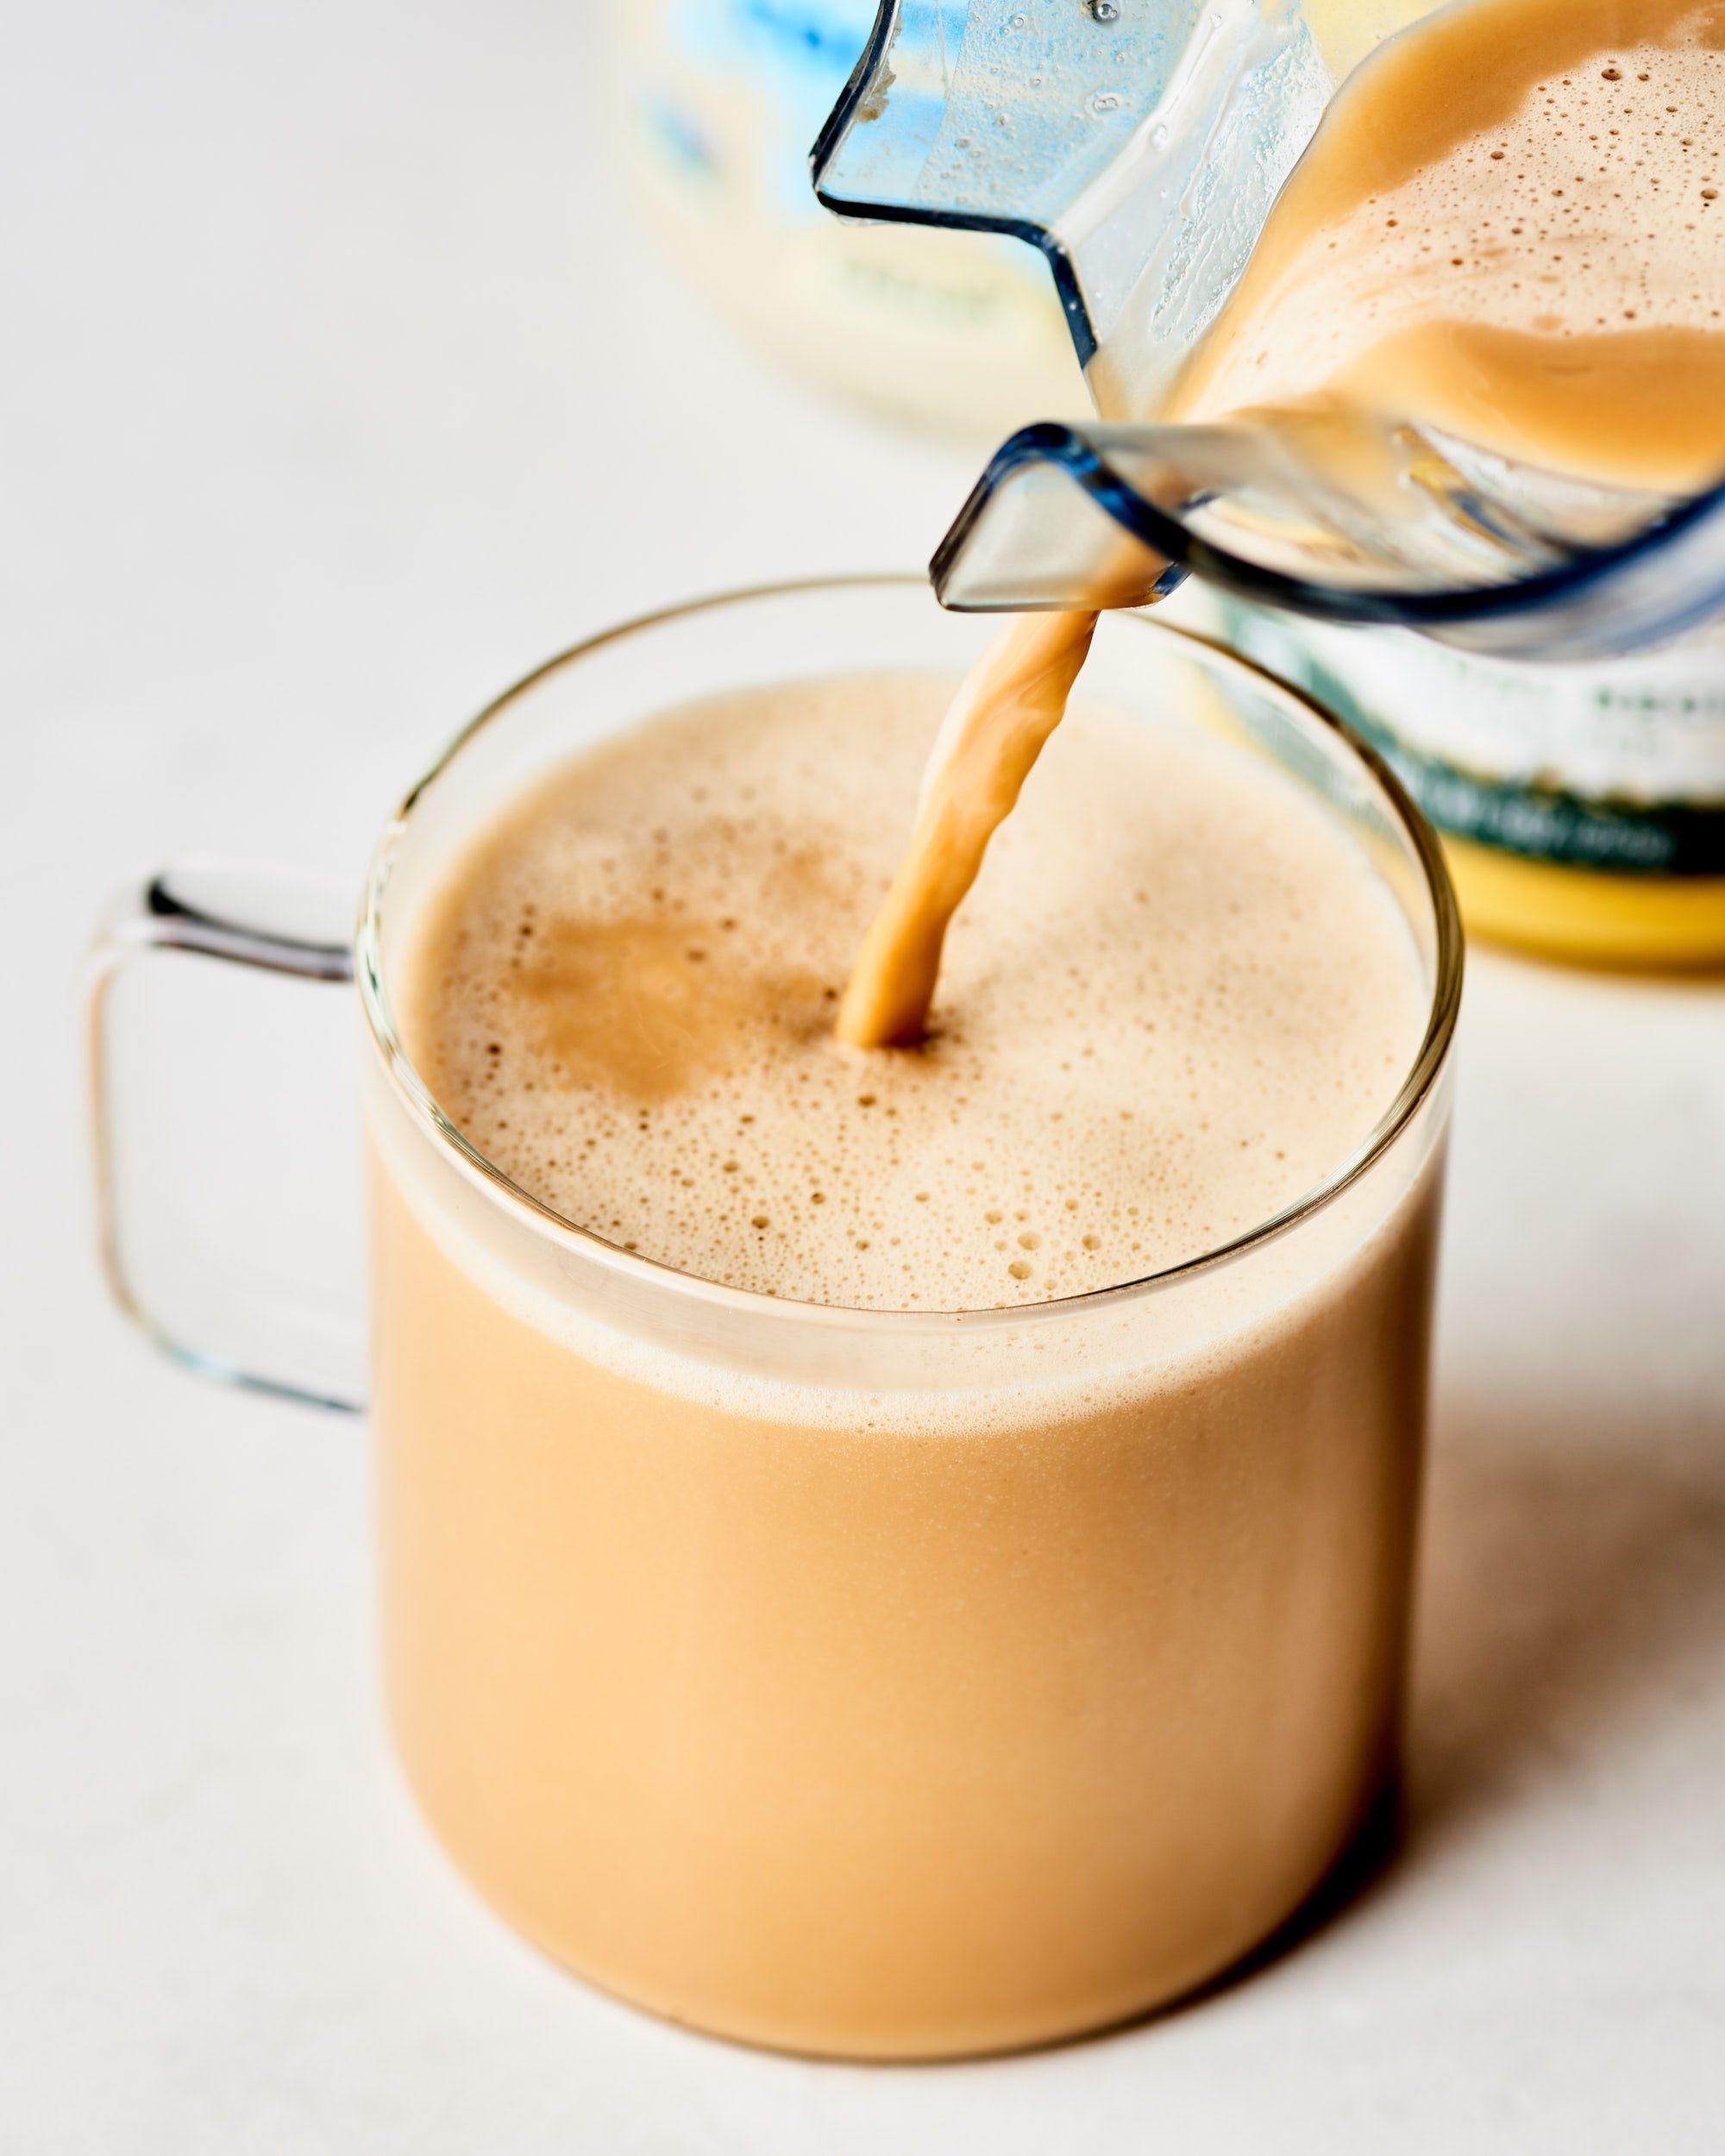 Here S How To Make Whole30 Coffee Creamer With Just Two Ingredients Coffee Creamer Coffee Creamer Recipe Creamer Recipe